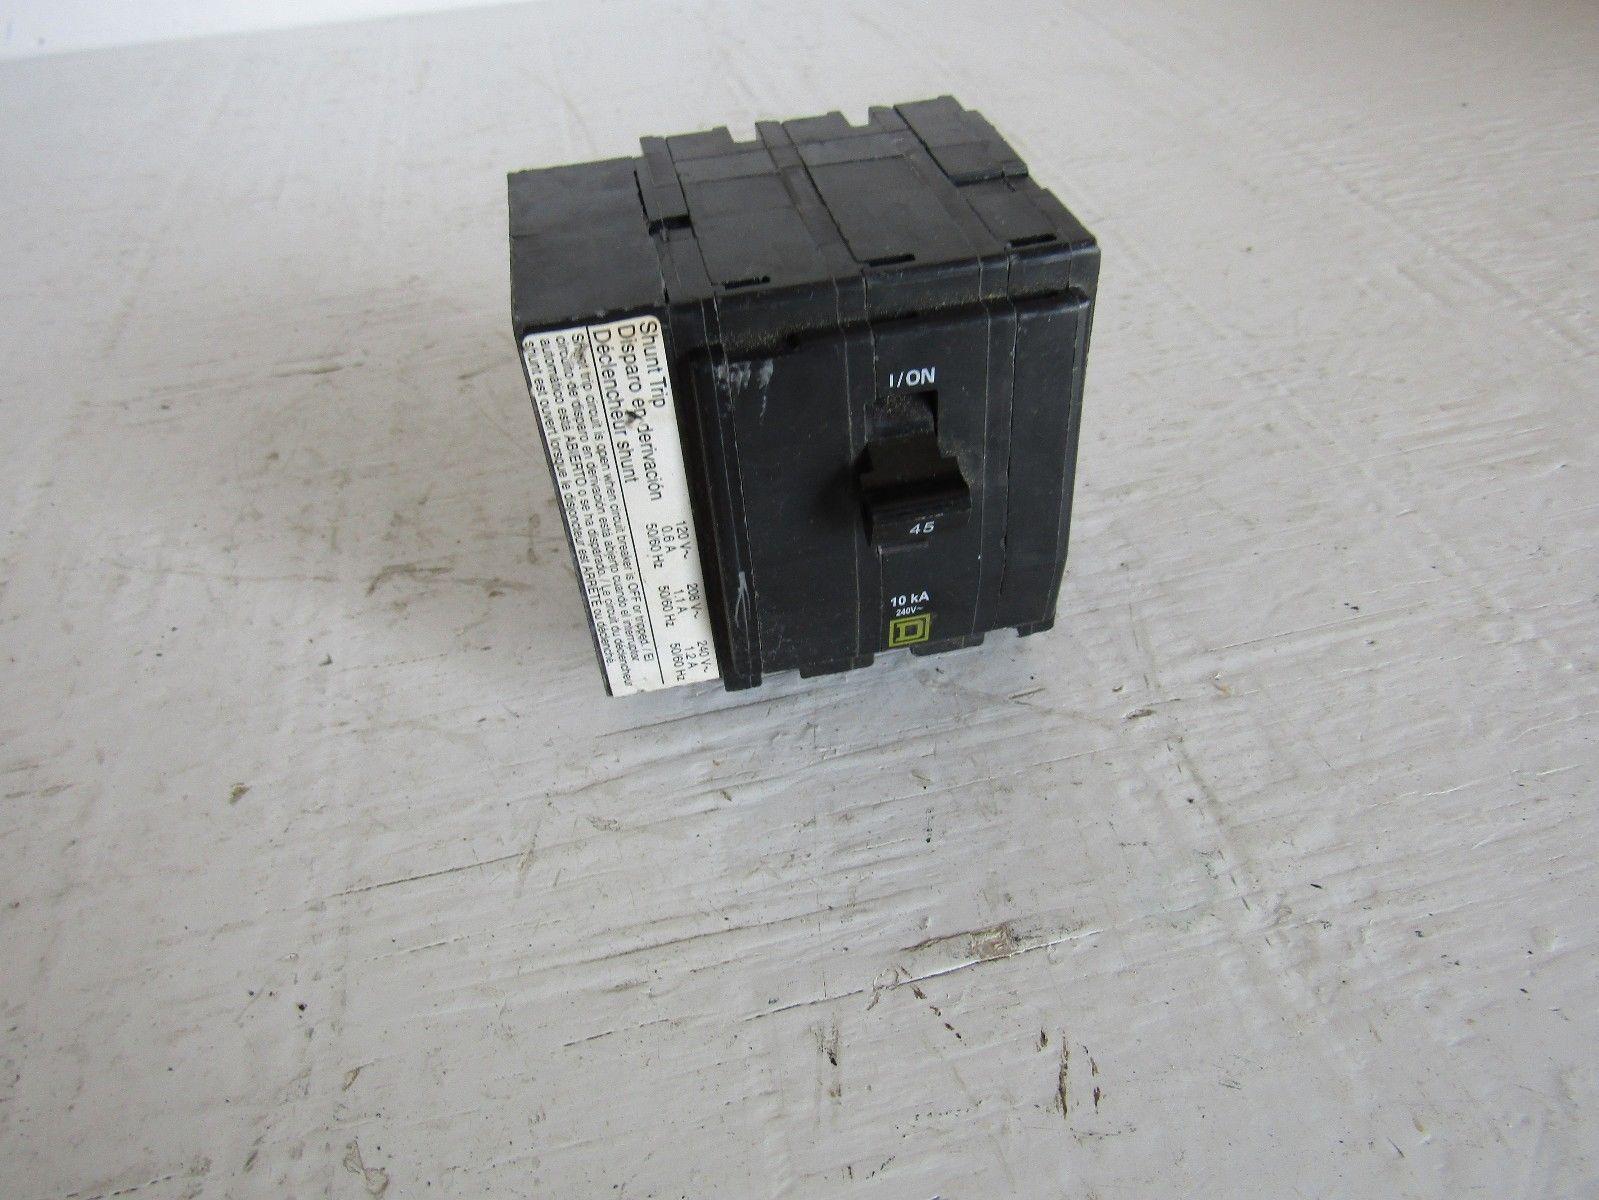 SQUARE D QO3451021 3 POLE 45 AMP 240 VOLT QO SHUNT TRIP BREAKER FITS NQOD 331929484140 4?fit=1000%2C750&ssl=1 shunt trip cb wiring diagram shunt trip connectors, square d on wire square d shunt diagram